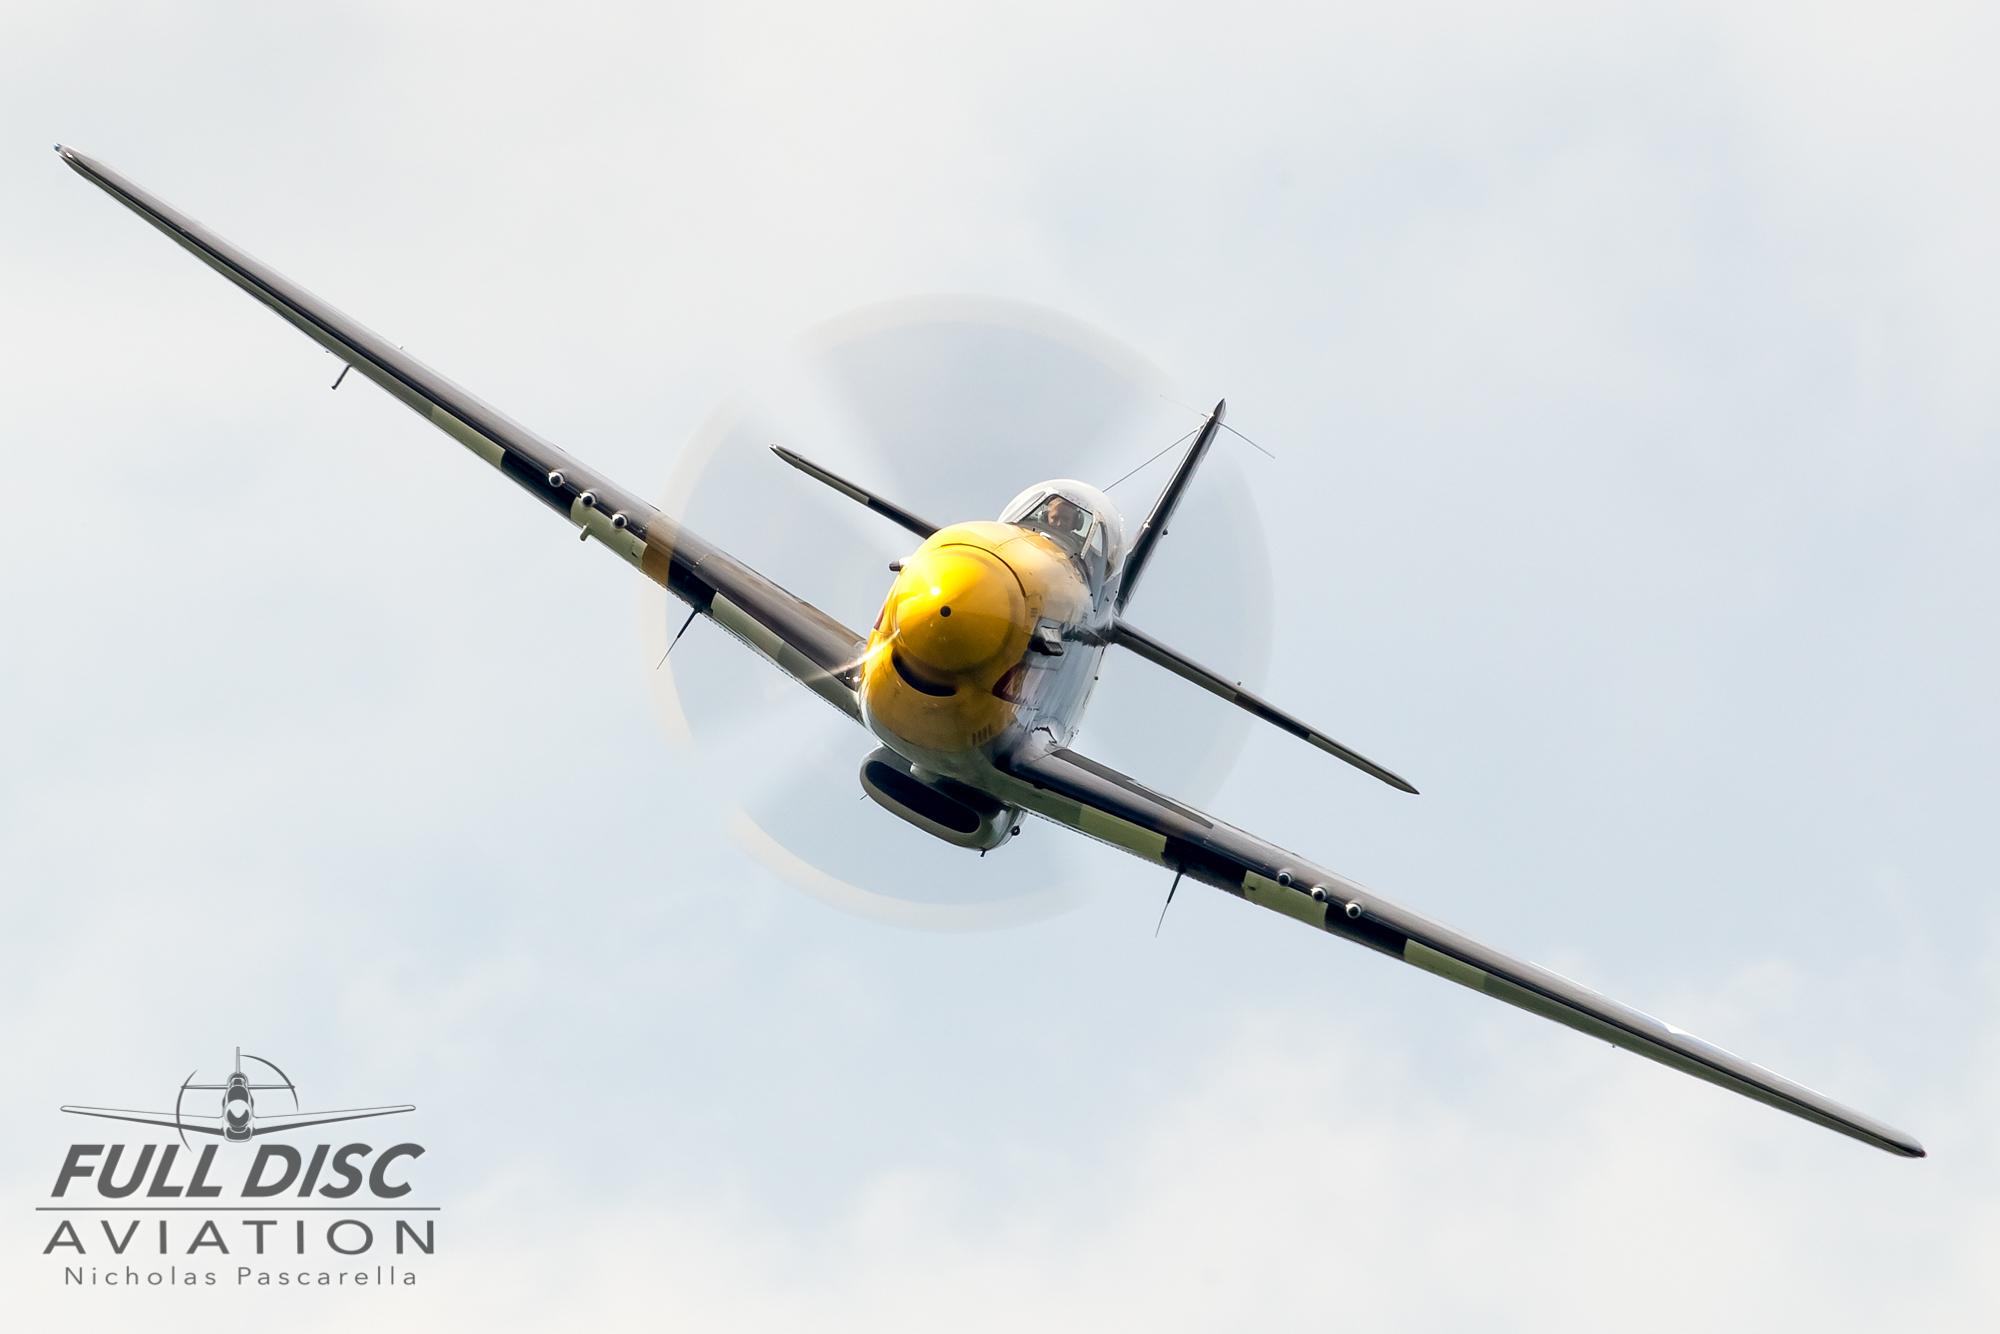 nickpascarella_nicholaspascarella_fulldiscaviation_aircraft_mustang_faceoff_nevermiss.jpg